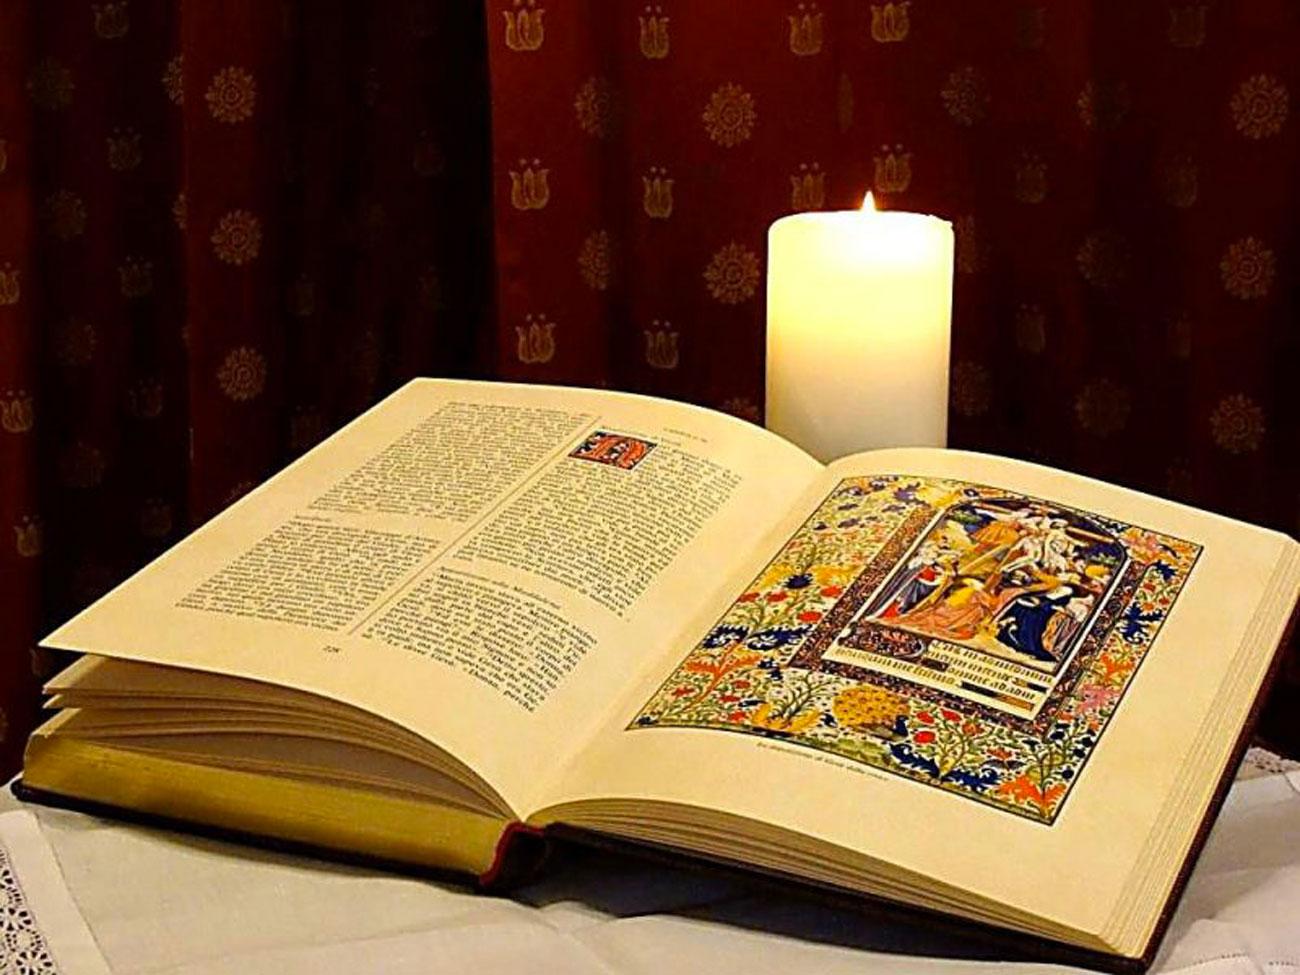 vangelo-gesù-filosofie orientali-natyan-studiogayatri-monza